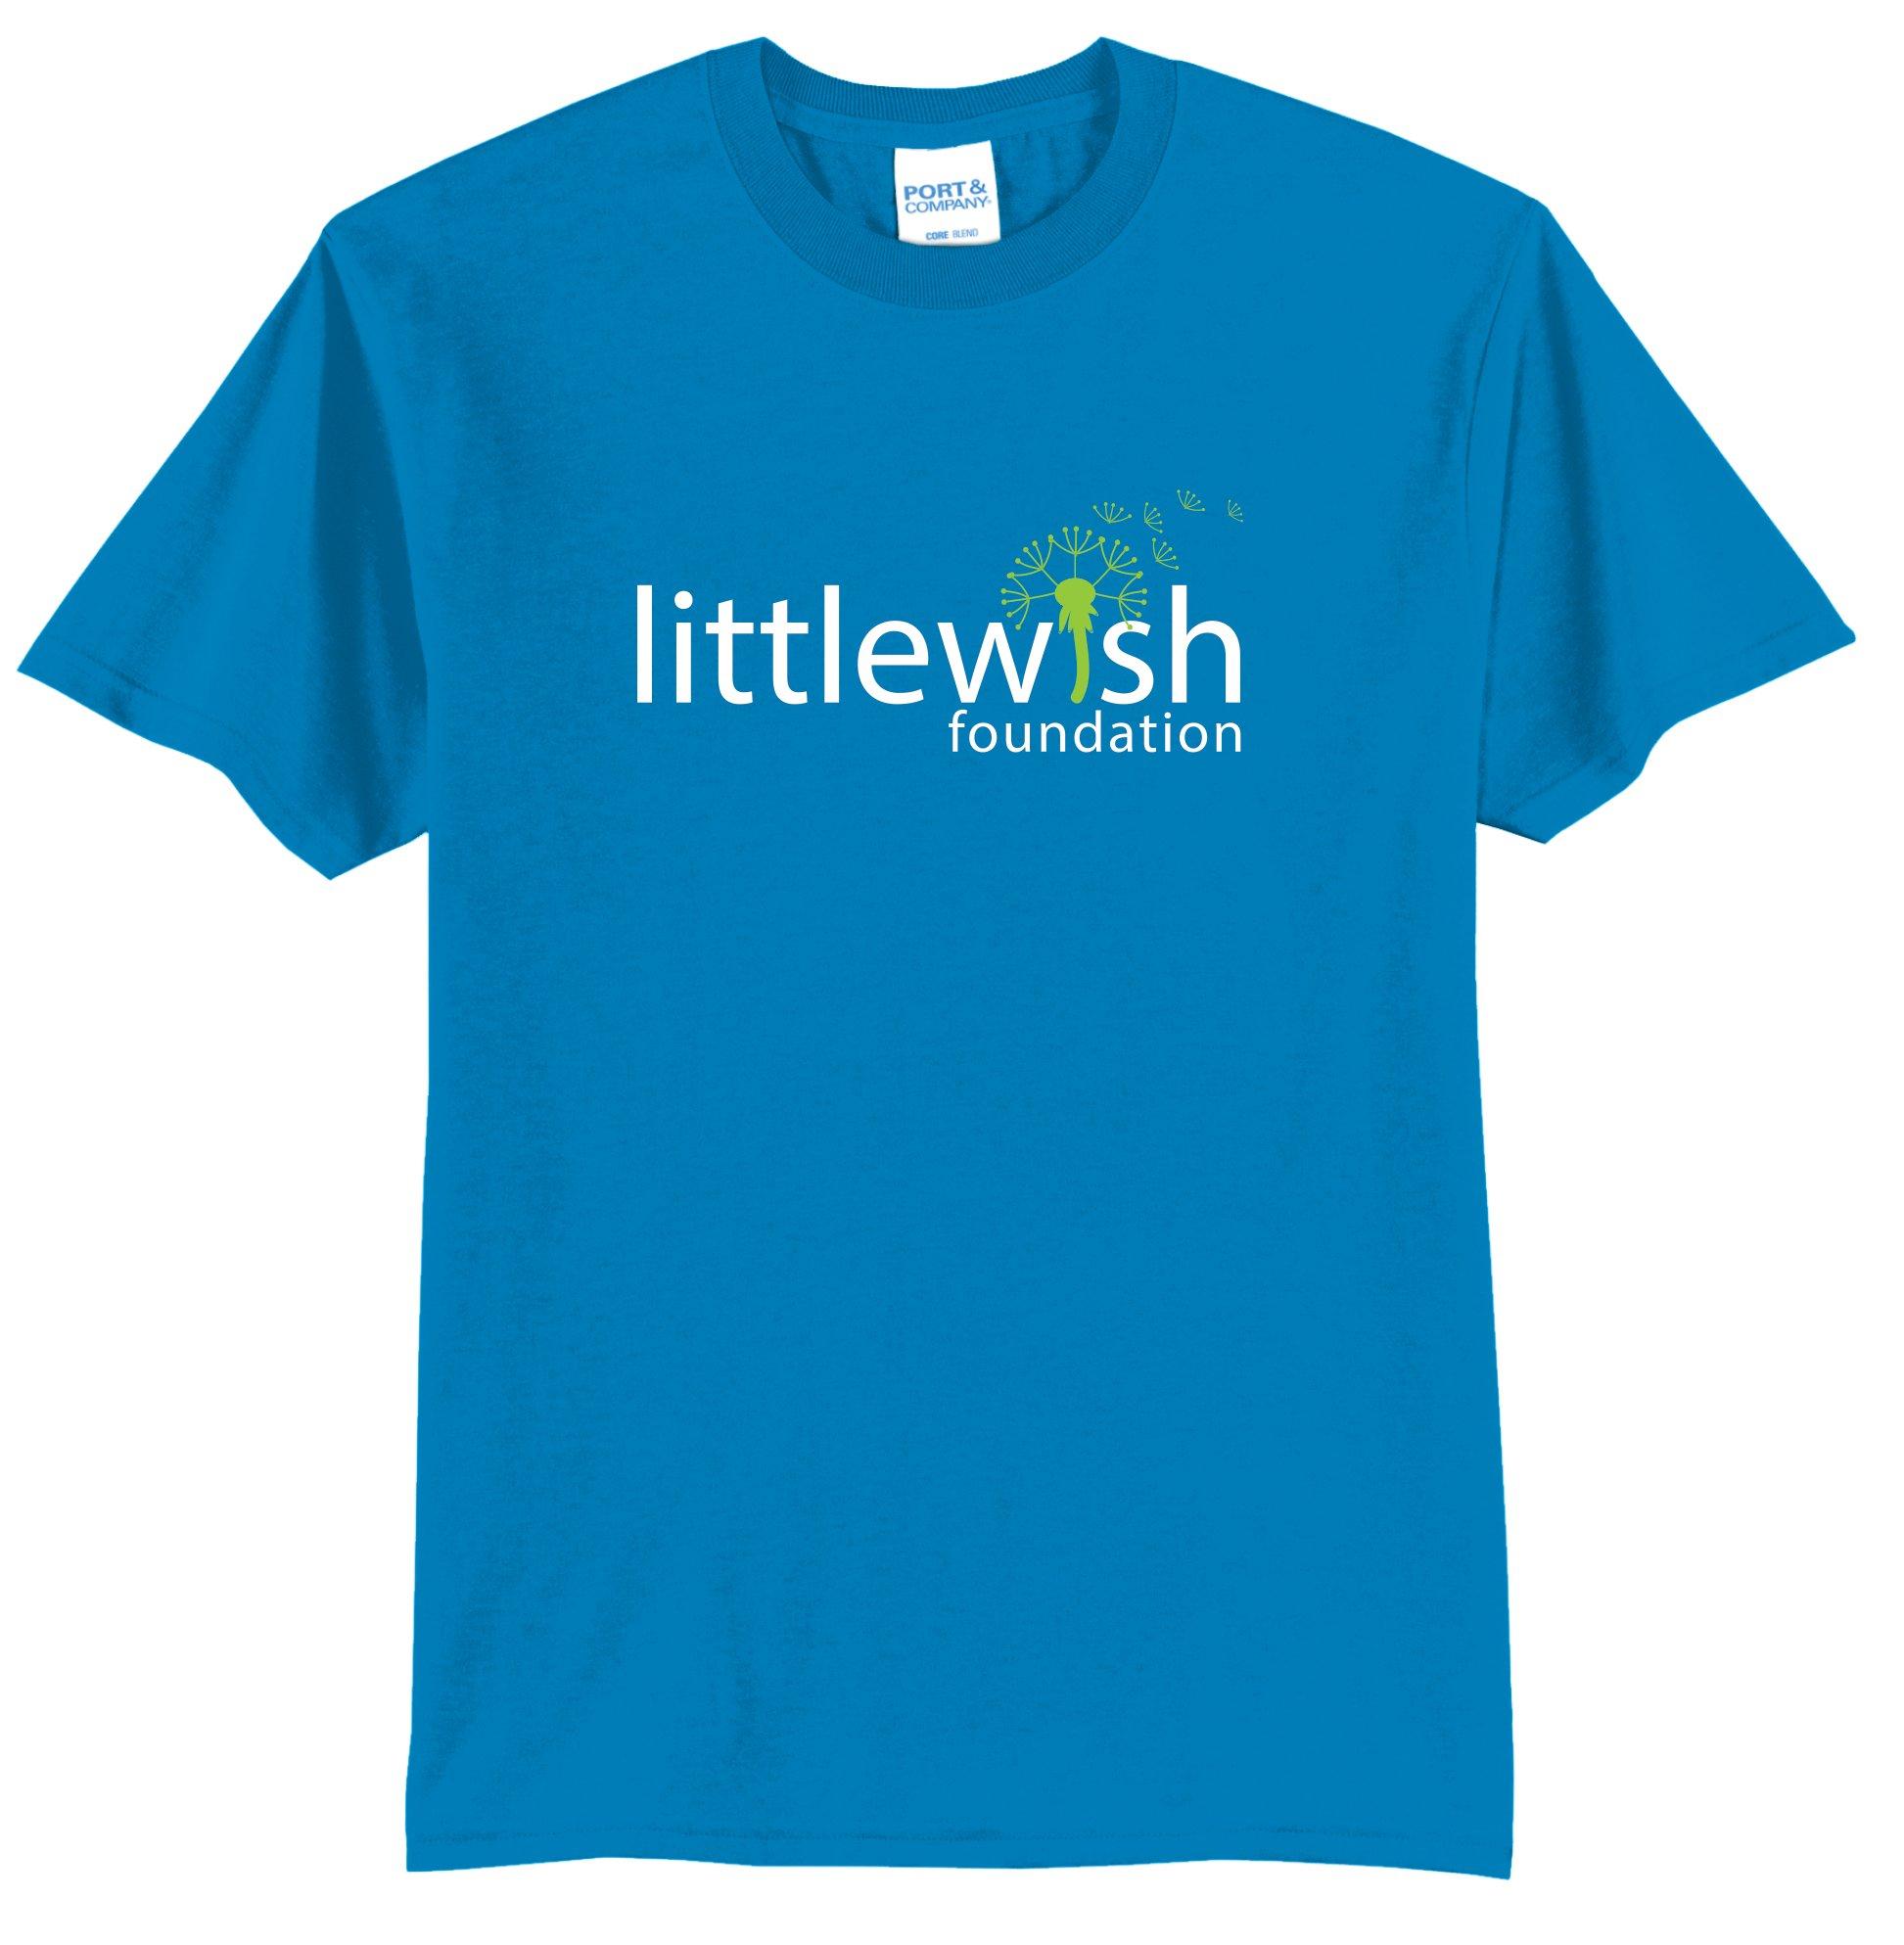 Little Wish Foundation Adult T-shirt 00001